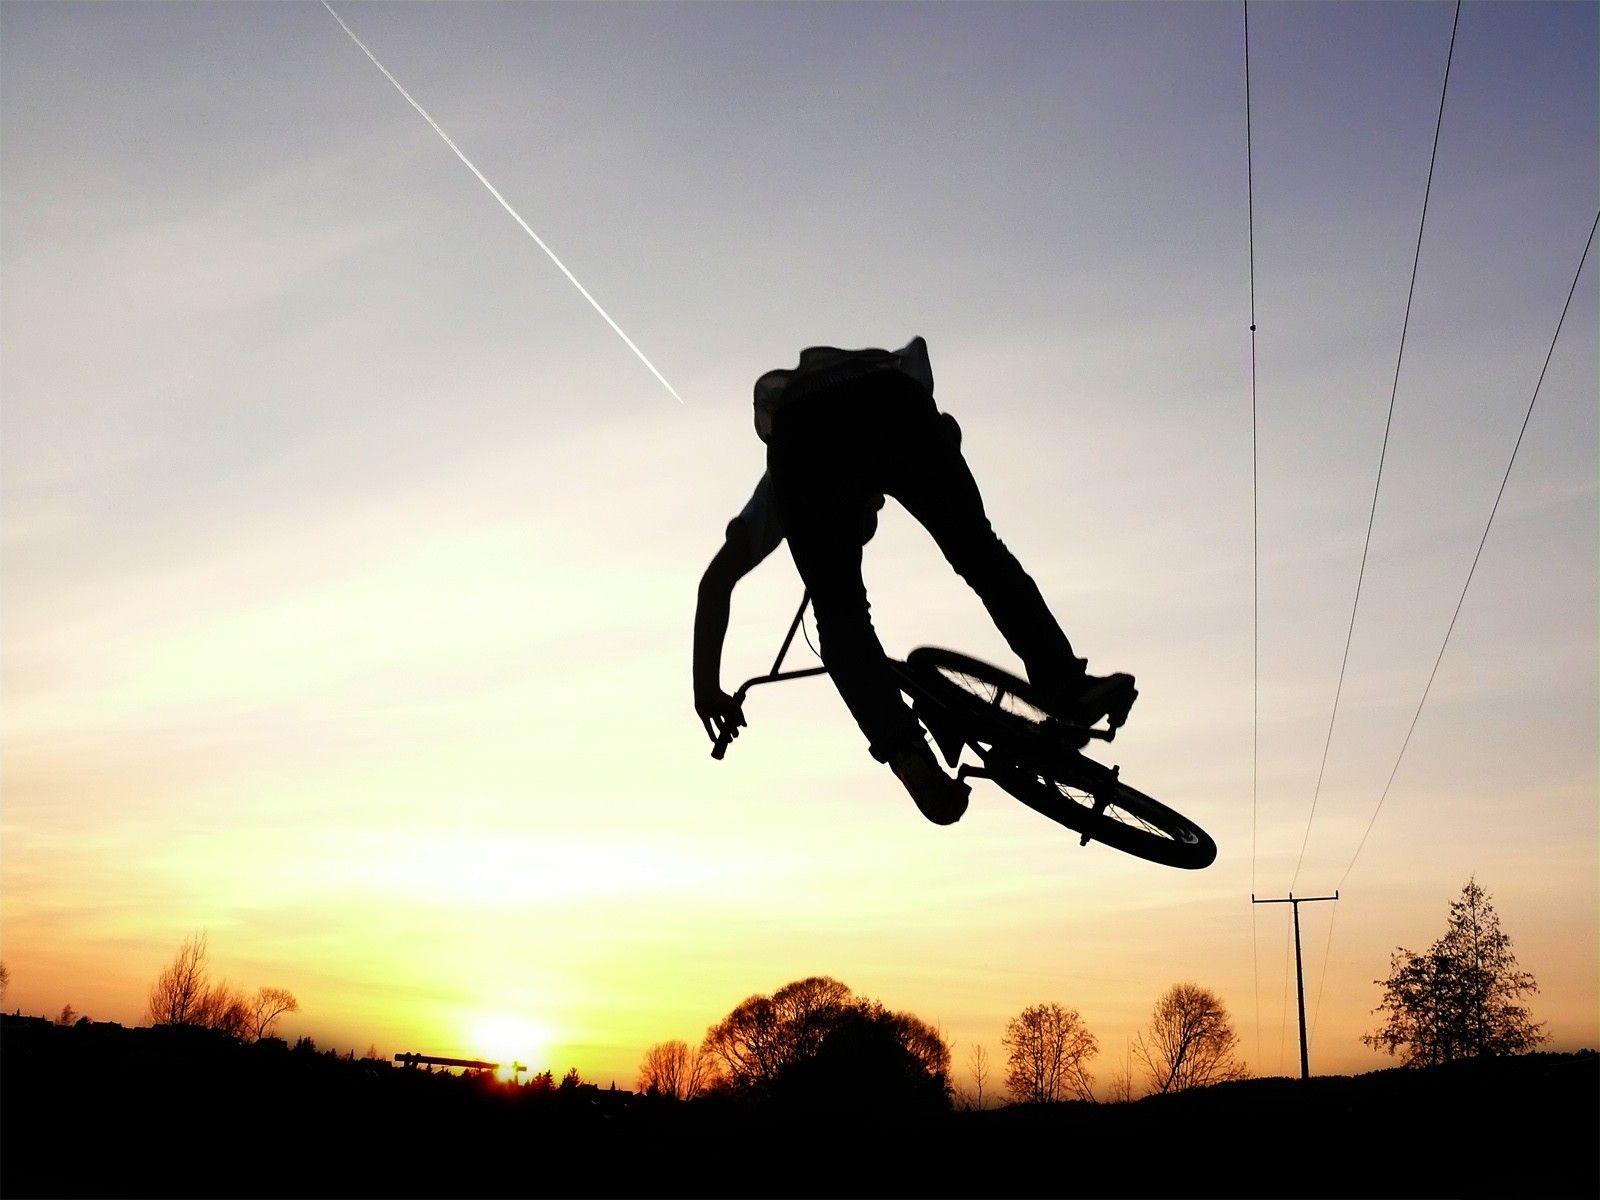 Sunset Abstract Silhouette Bmx Stunt Bike Freestyle Bmx Freestyle Bmx